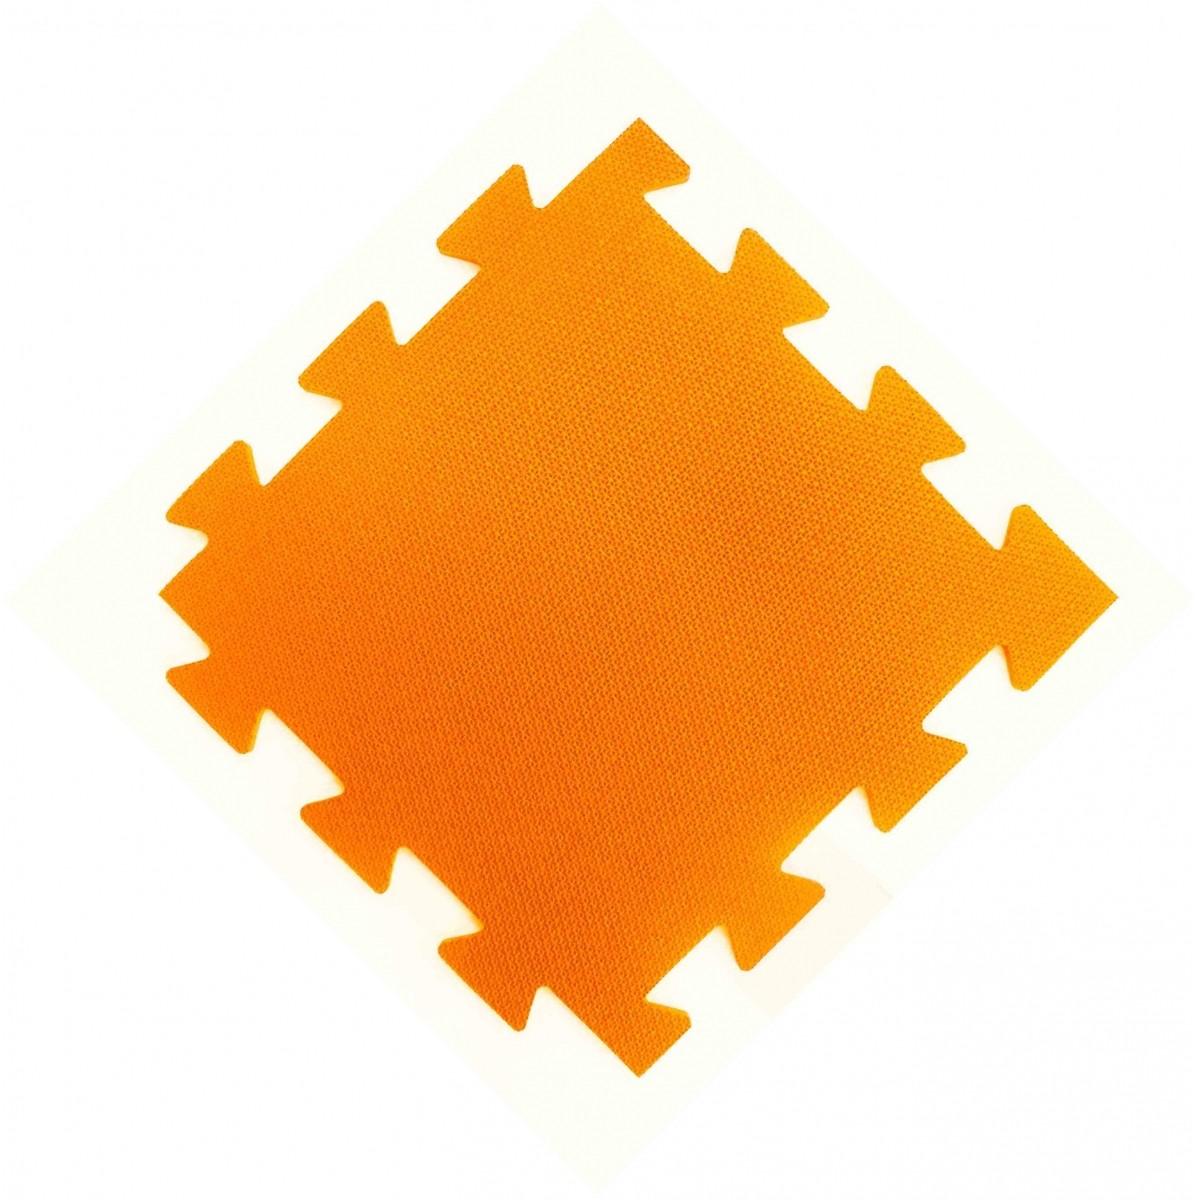 Tatames 50x50cm Com 10mm de Espessura   Laranja  -